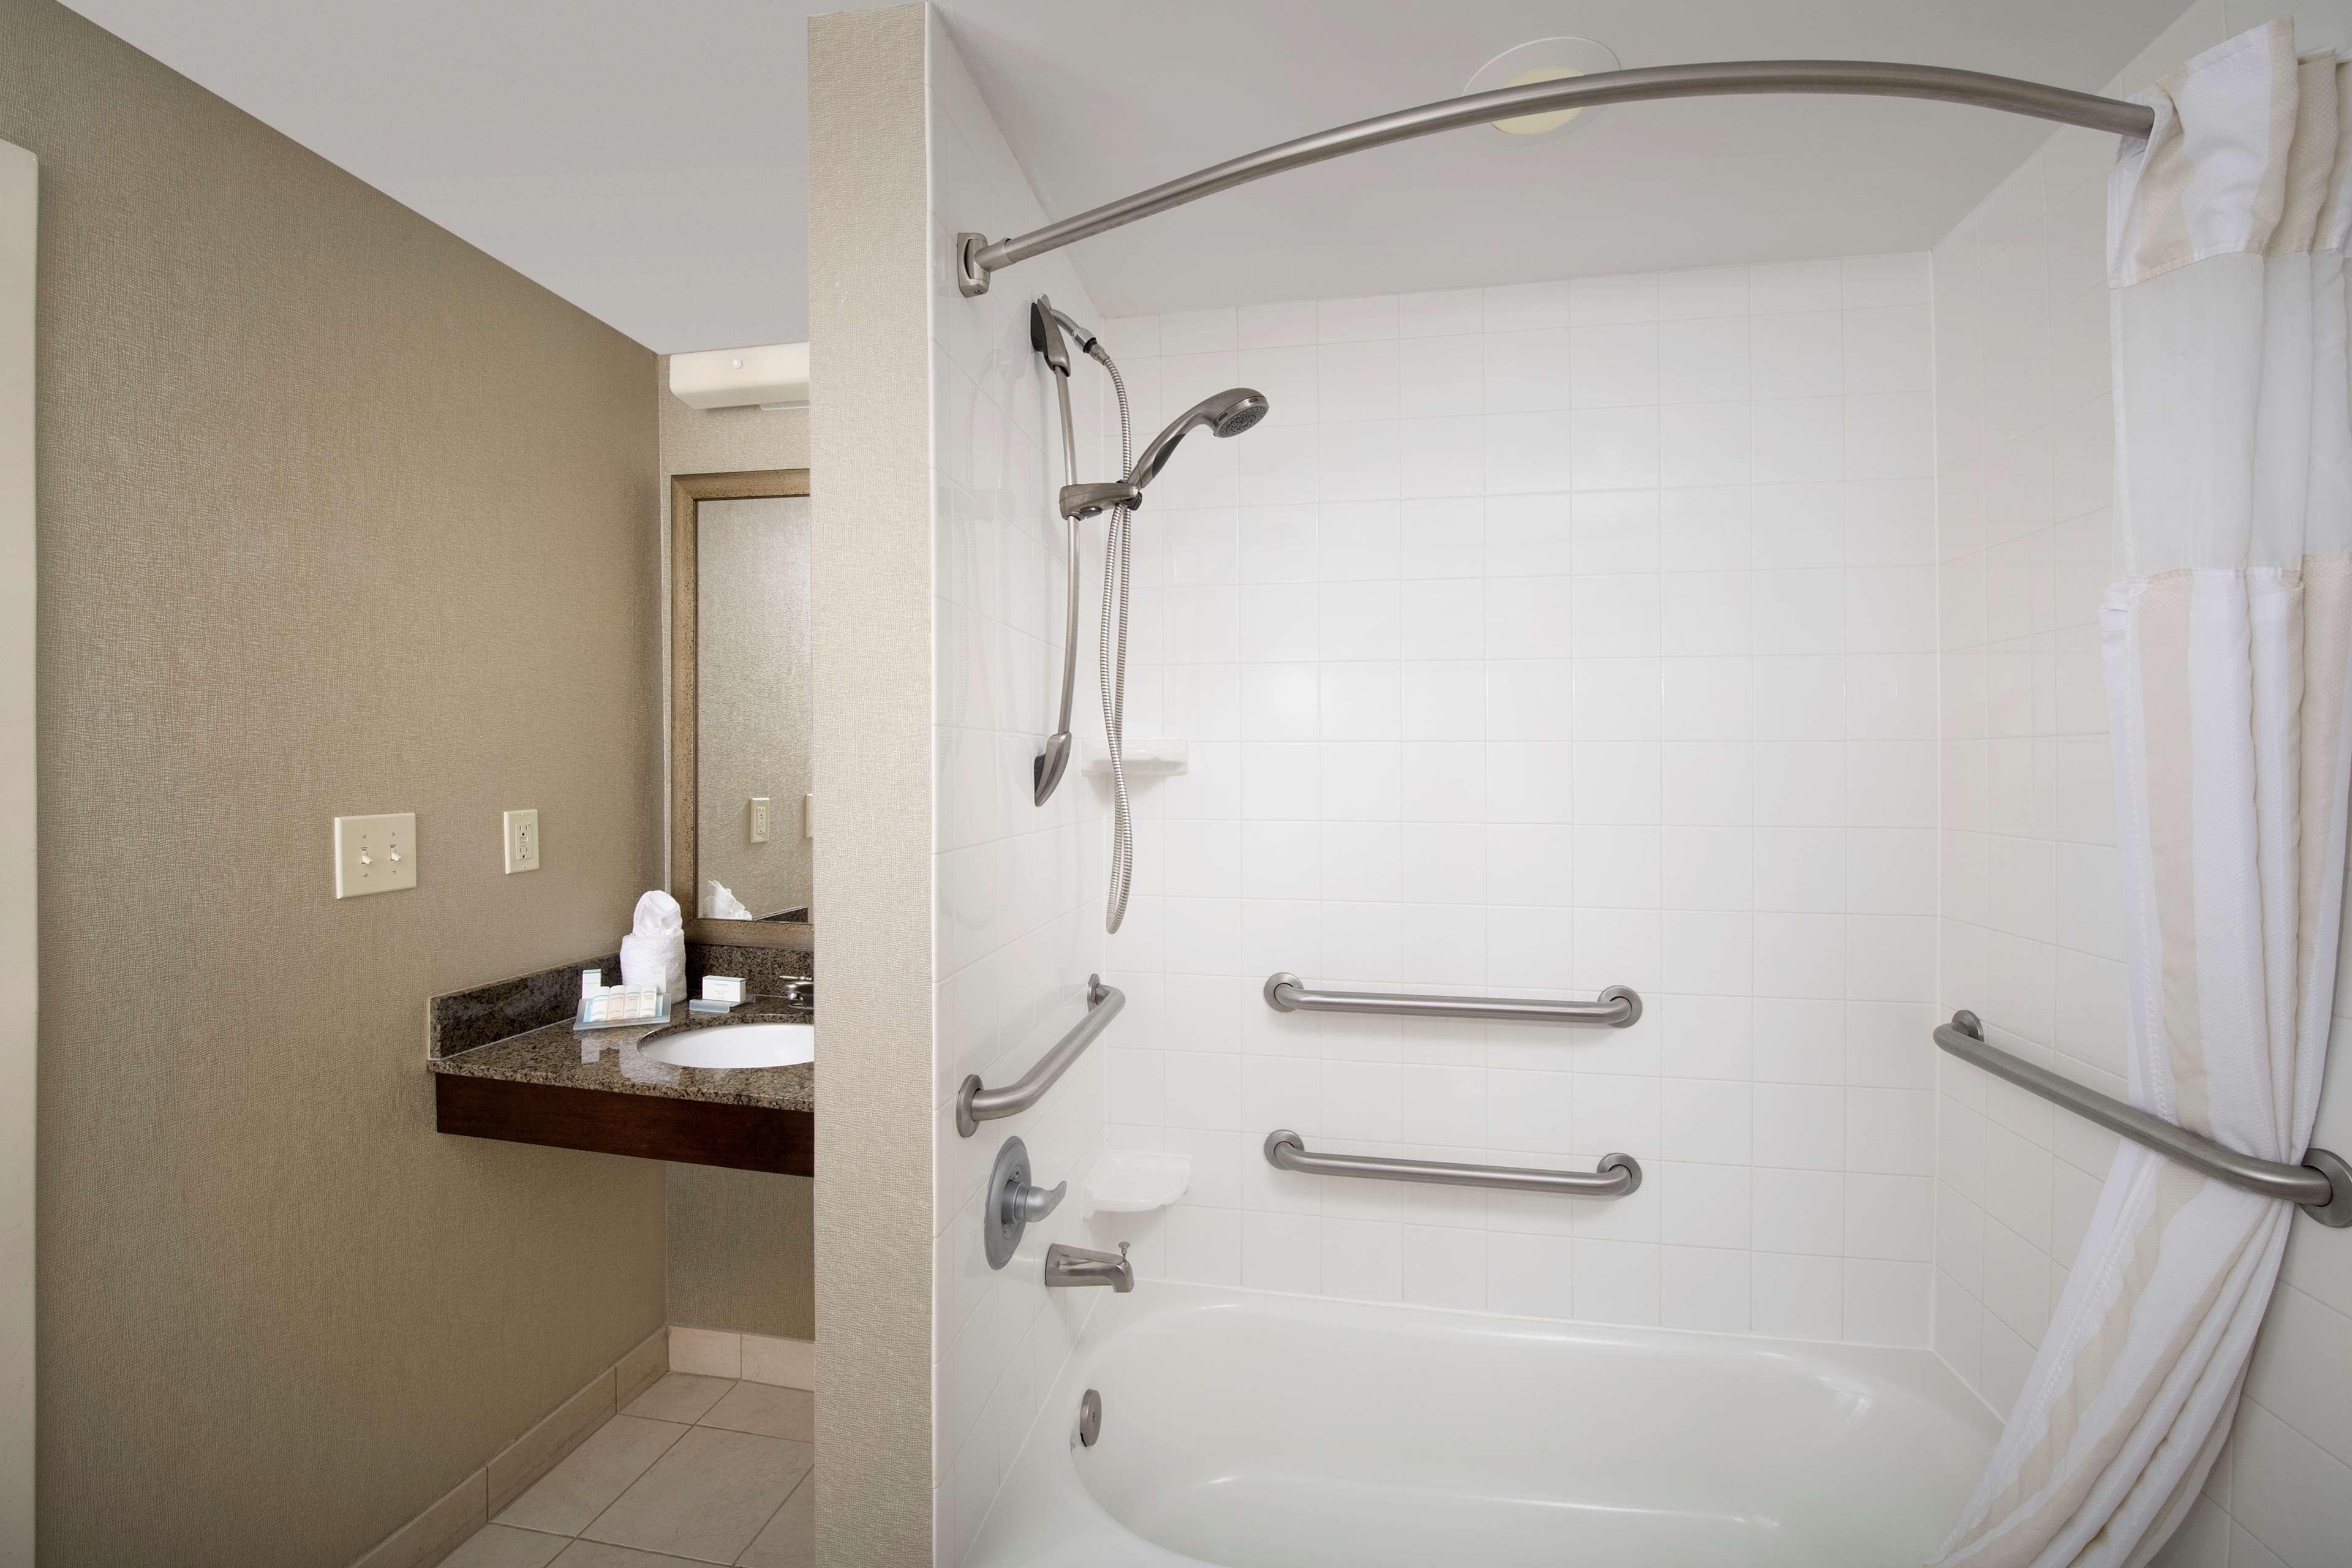 Hilton Garden Inn Winston-Salem/Hanes Mall image 19